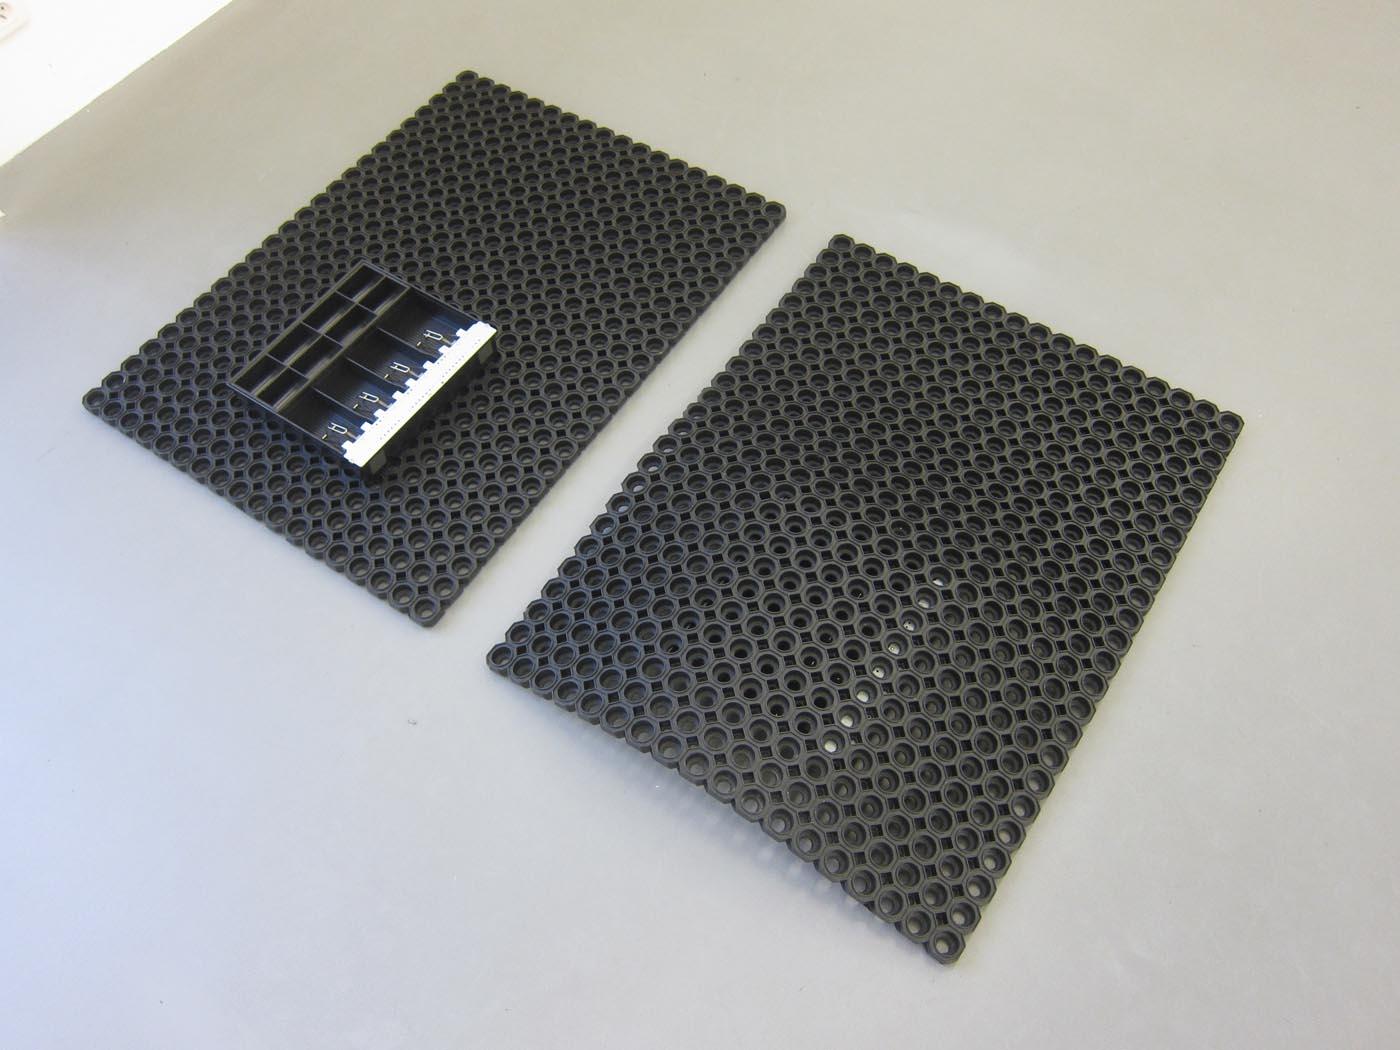 <i>Pillow Objects</i><br>2017, a rubber mat on top of a cash drawer and a cash drawer on top of a rubber mat<br>un tiroir-caisse sur un tapis en caoutchouc et un tapis en caoutchouc sur un titoir-caisse